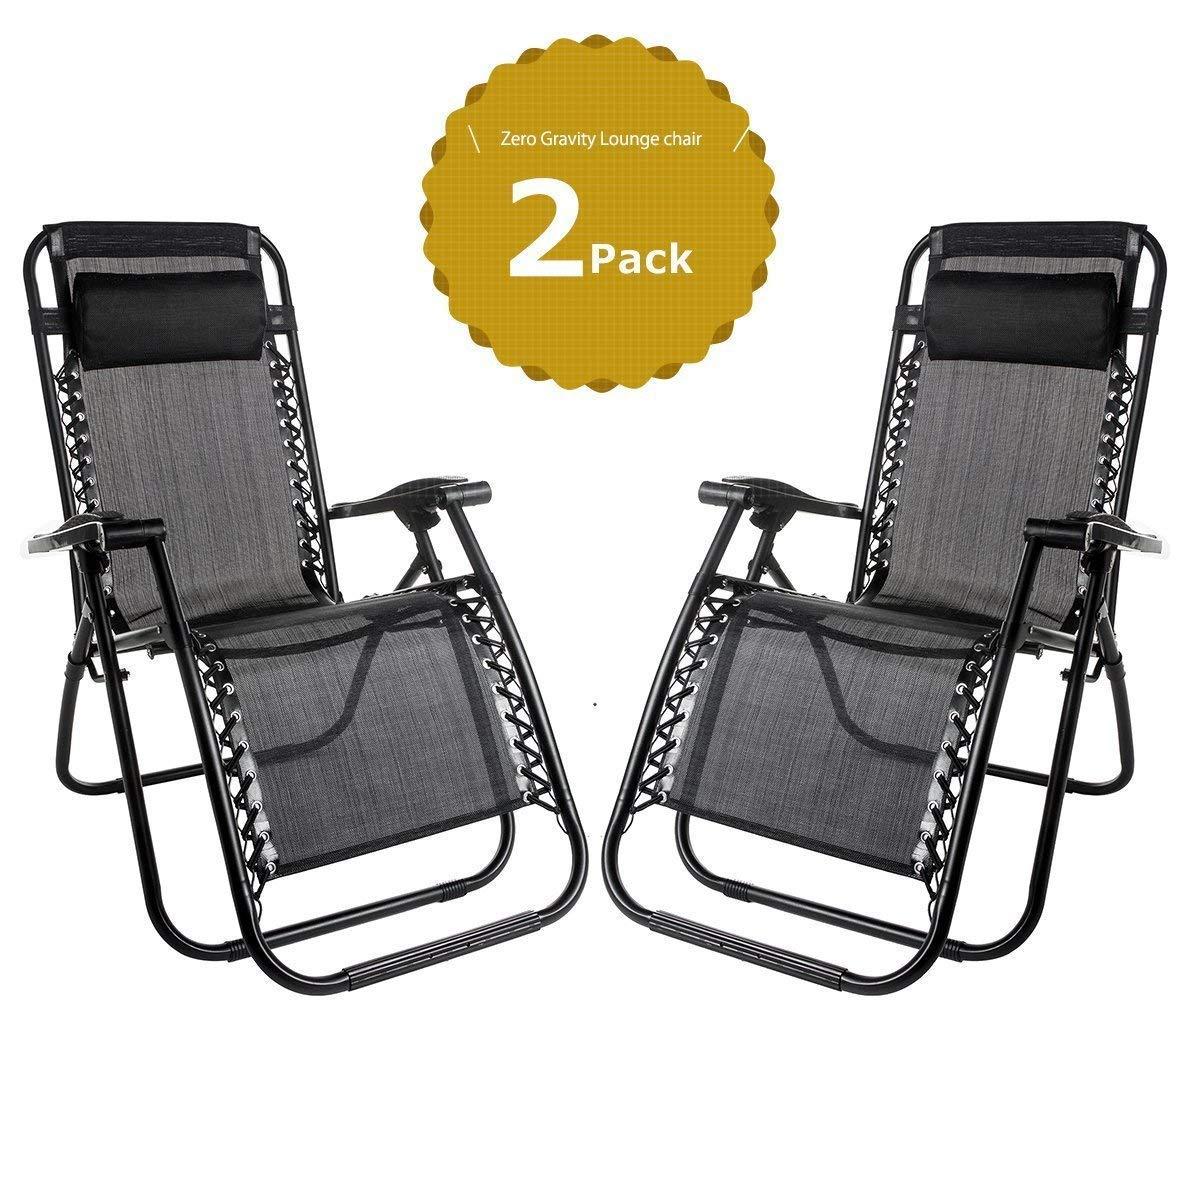 Tumbona reclinable Leisure Zone®, plegable, para jardín y ...